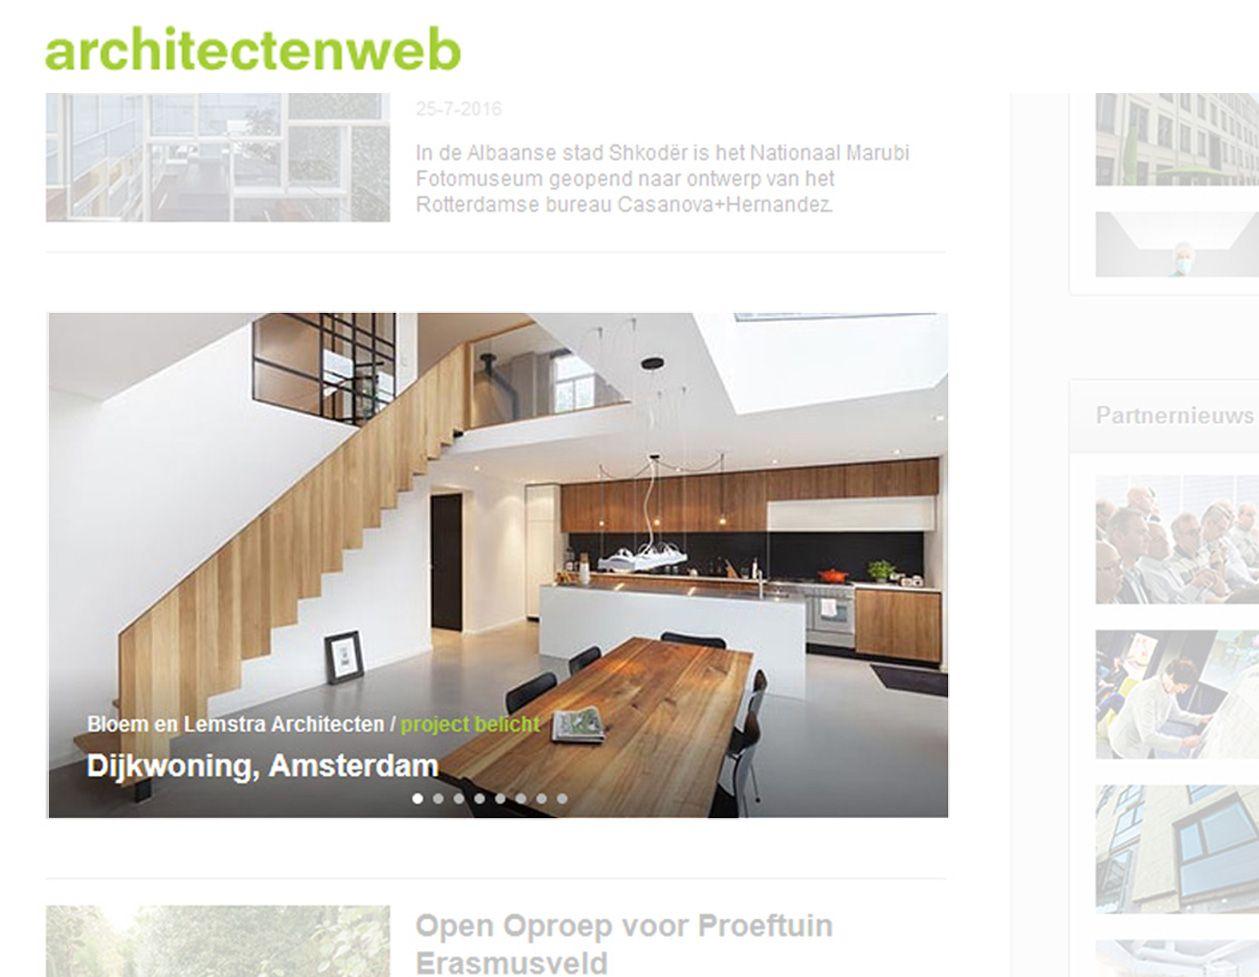 punblicatie dijkwoning project belicht architectenweb